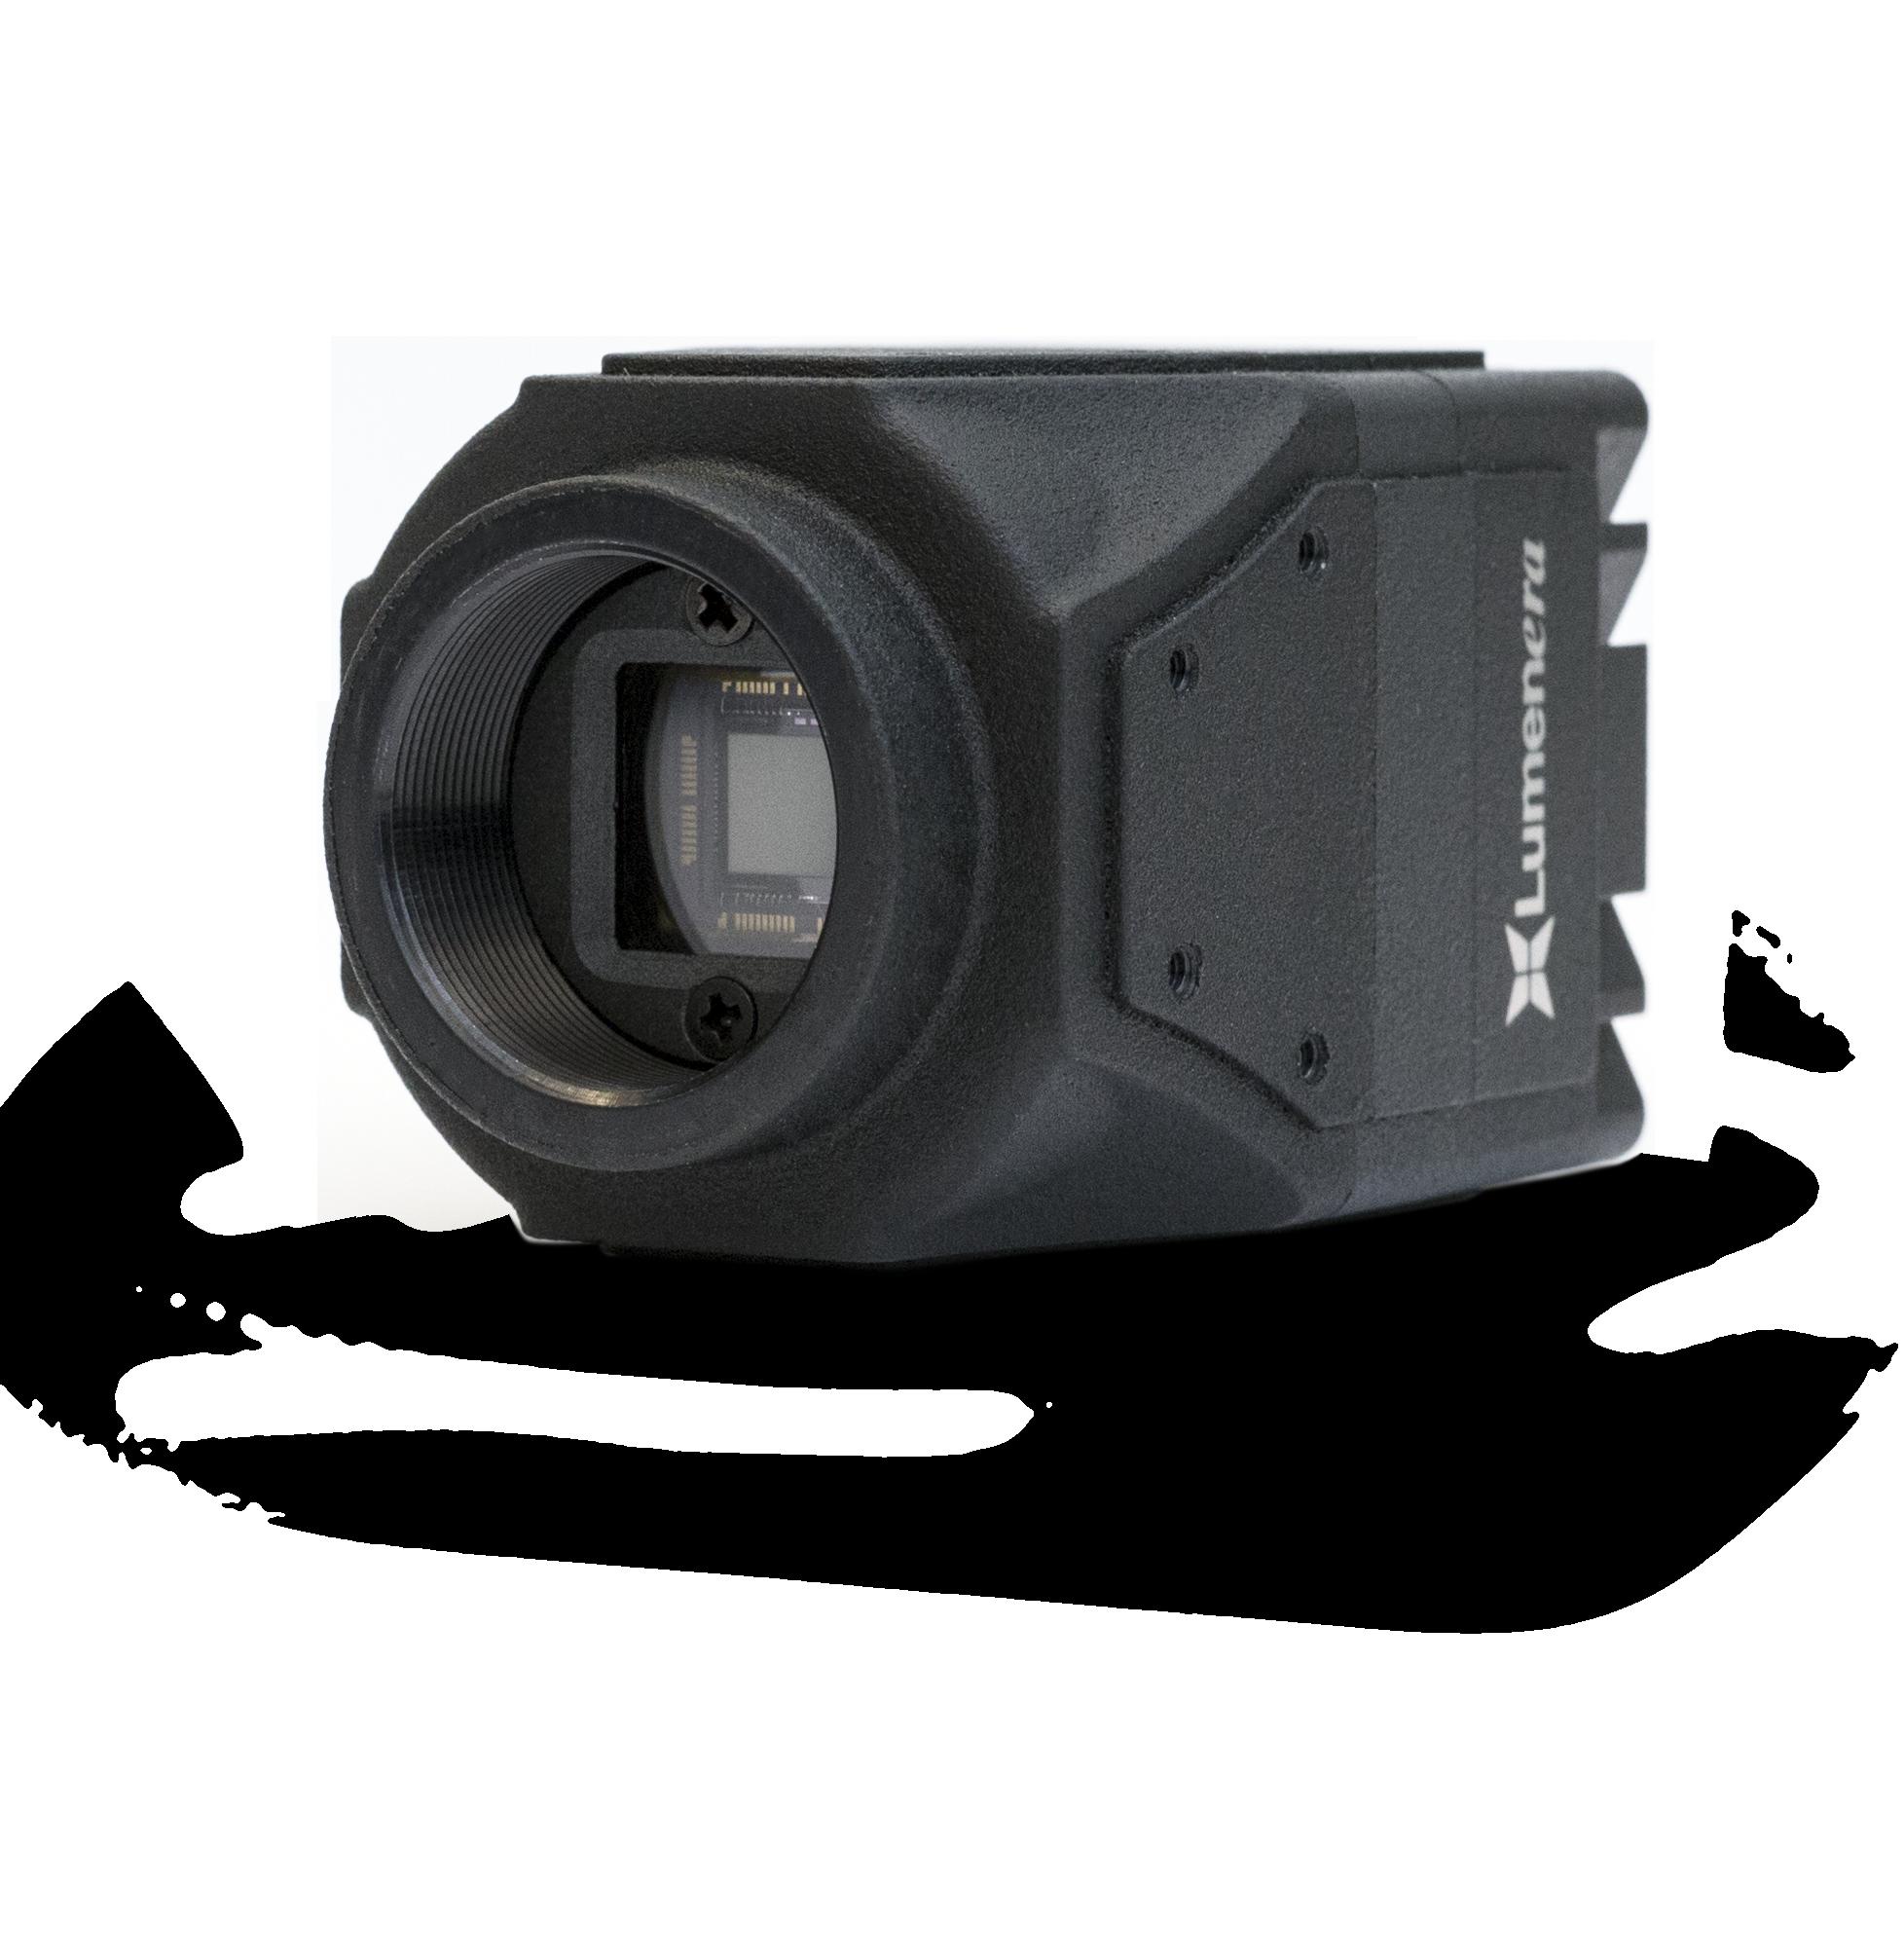 USB 3.0 Cameras – How Far Can You Really Go?